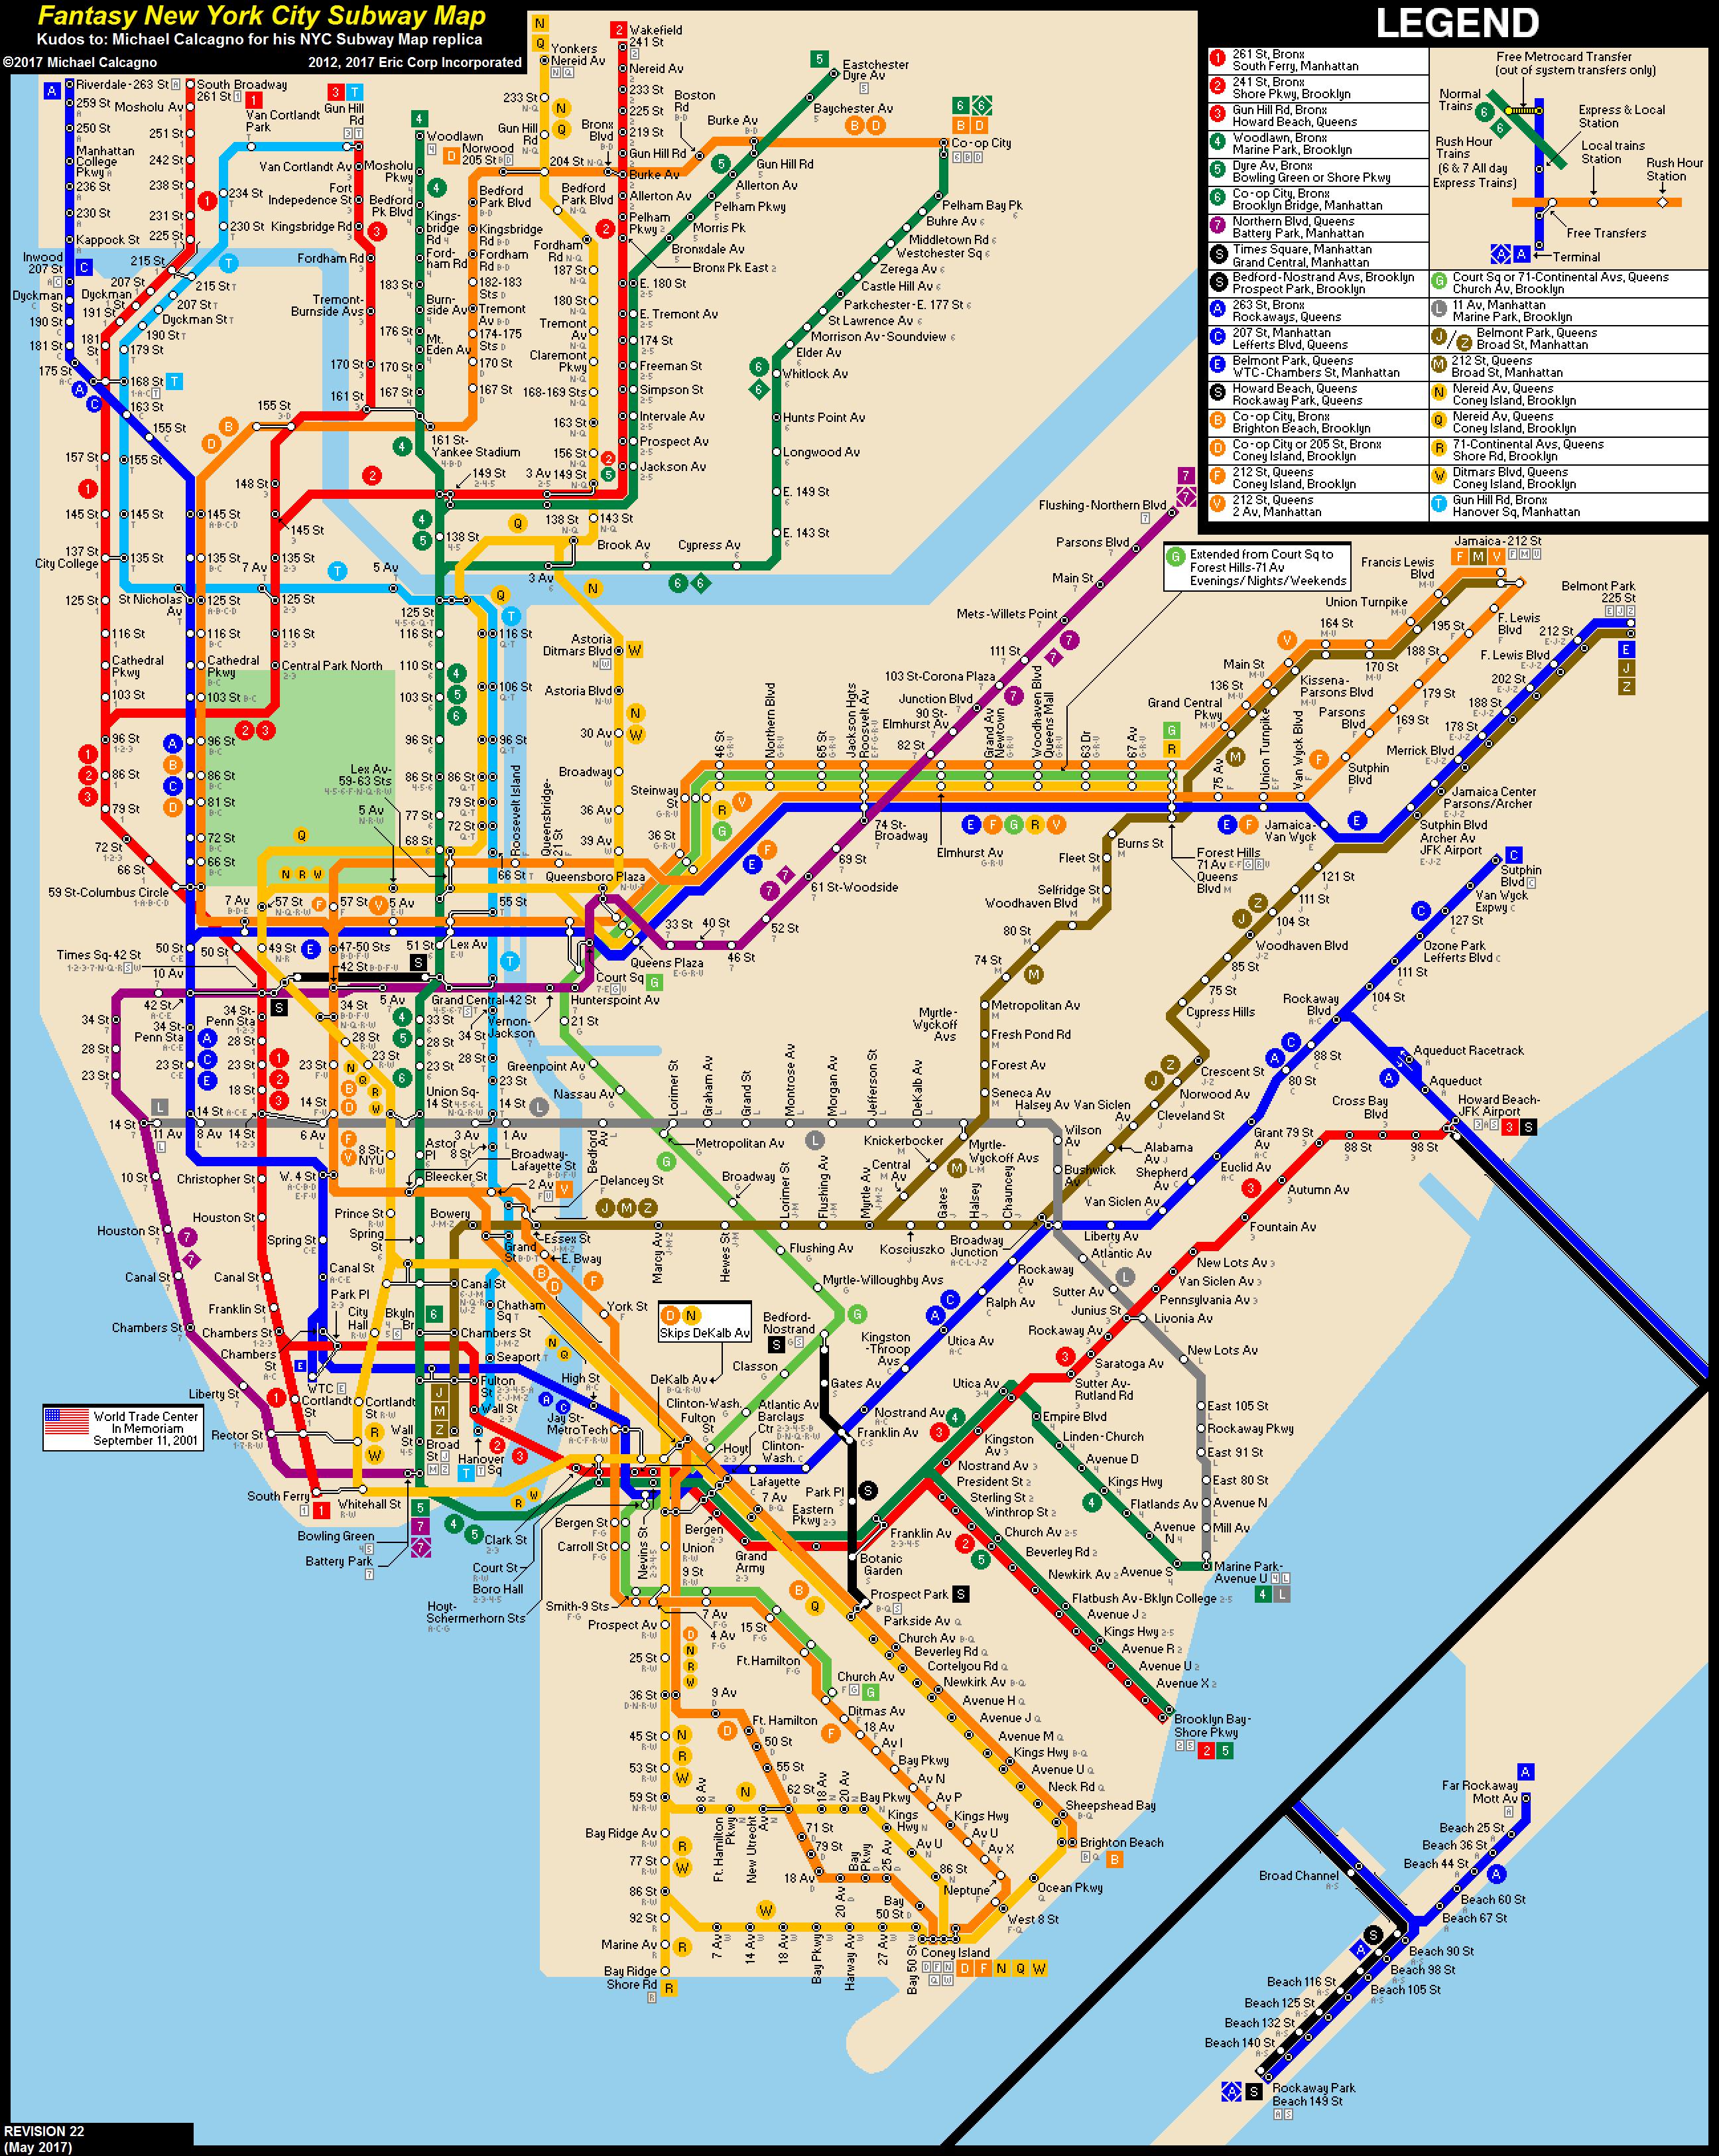 subway map f train Nyc Subway Fantasy Map Revision 22 By Ecinc2xxx On Deviantart